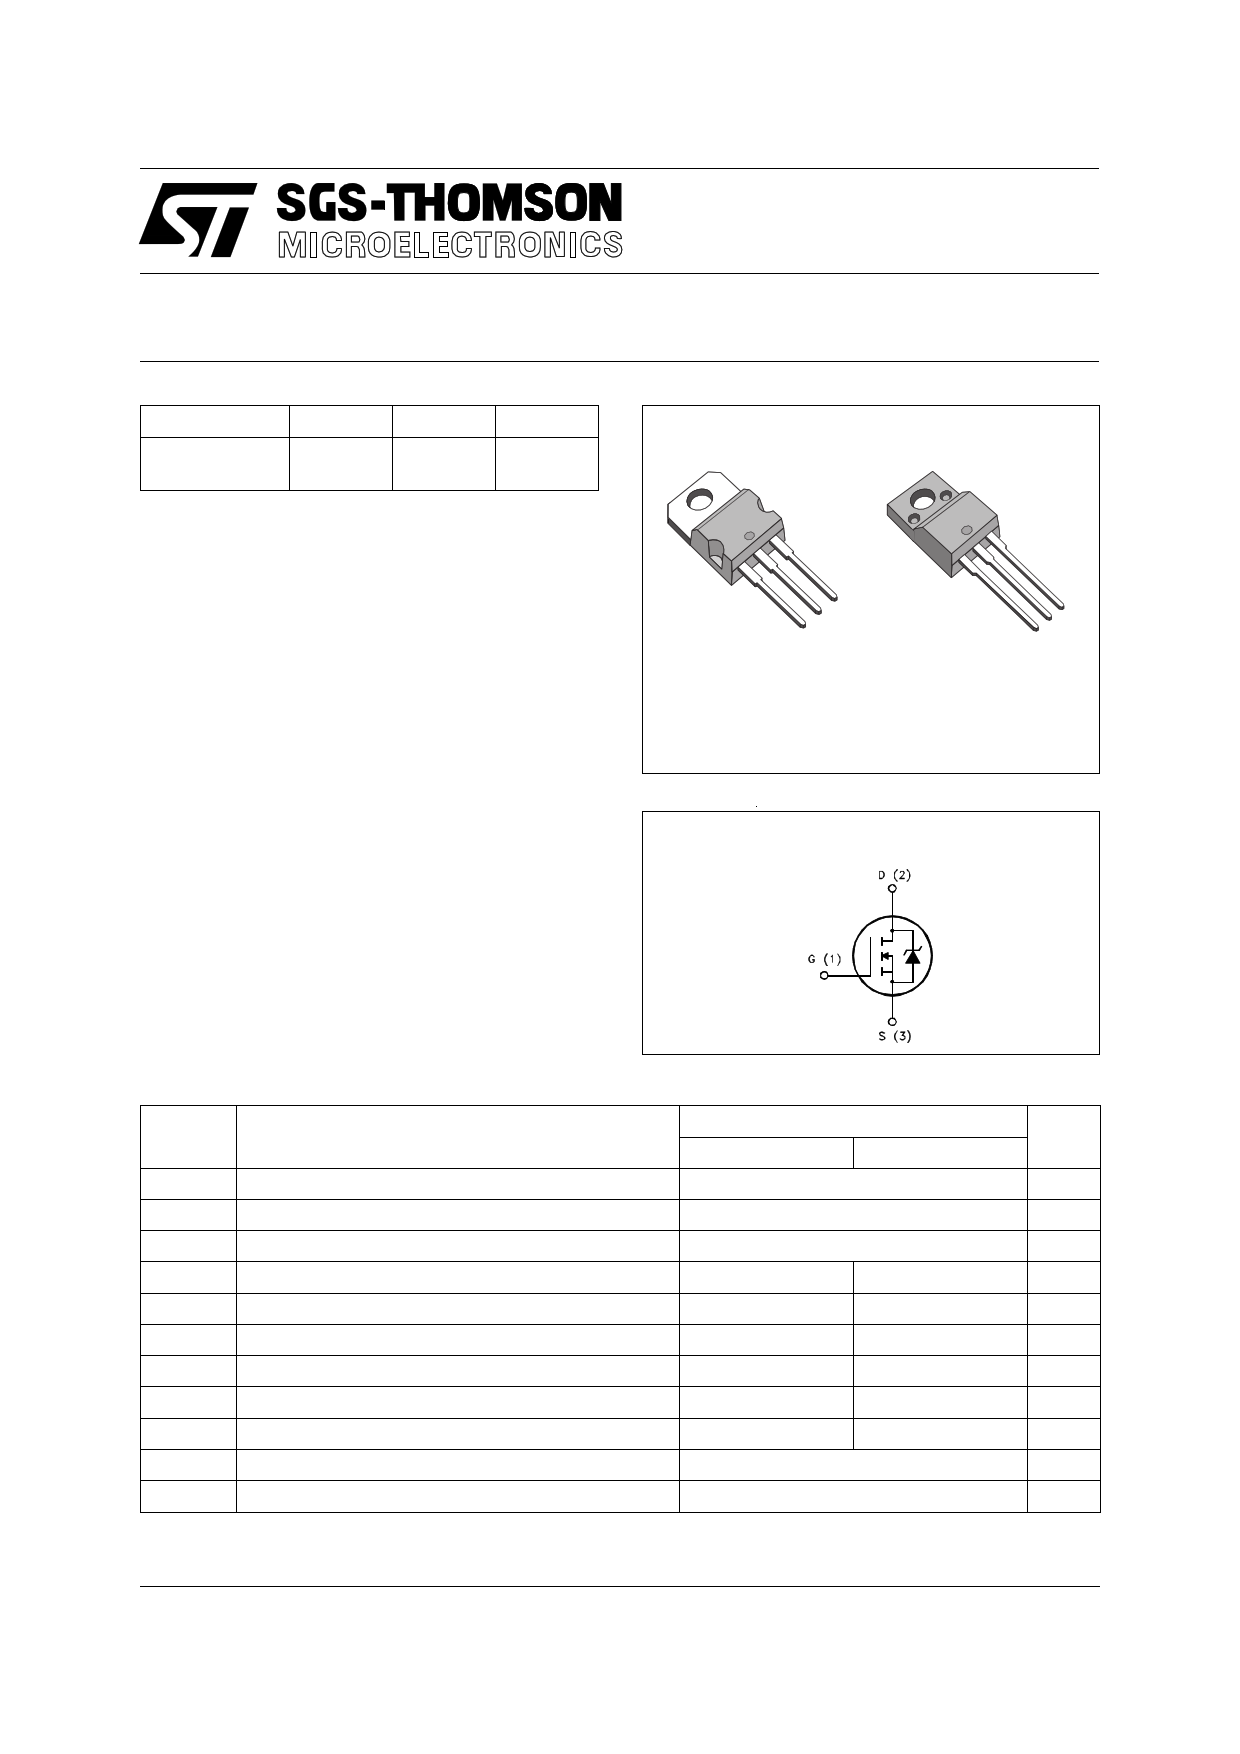 P3NA60 datasheet, circuit